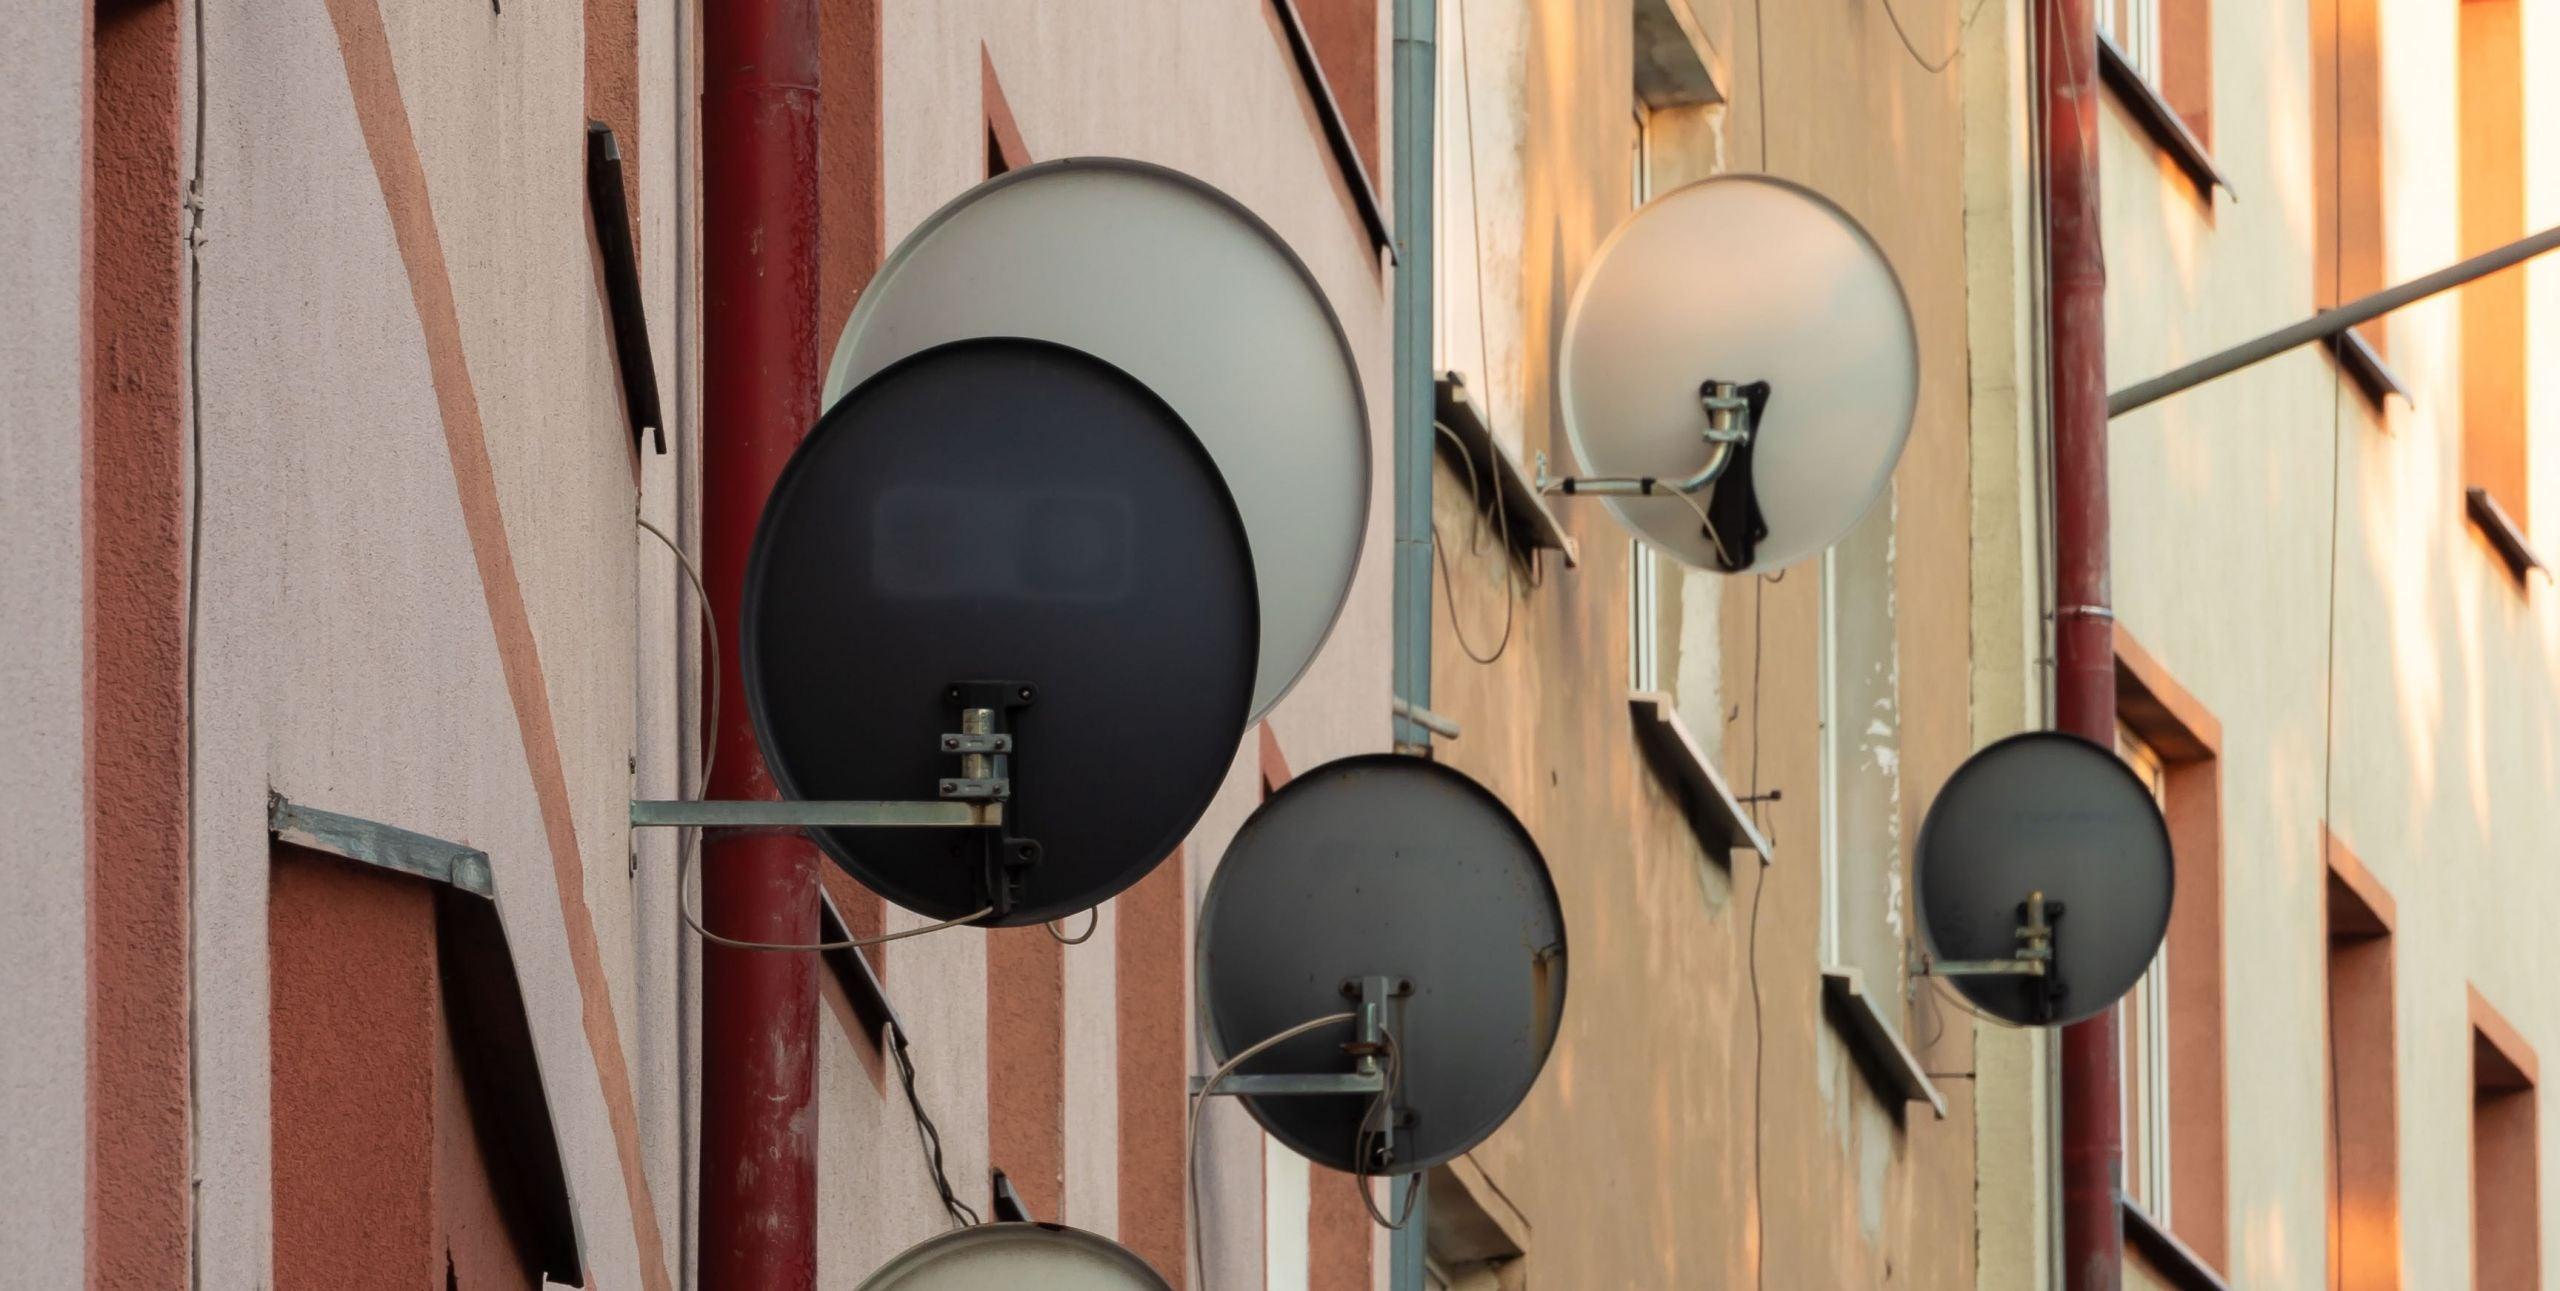 Starlink satellite dishes